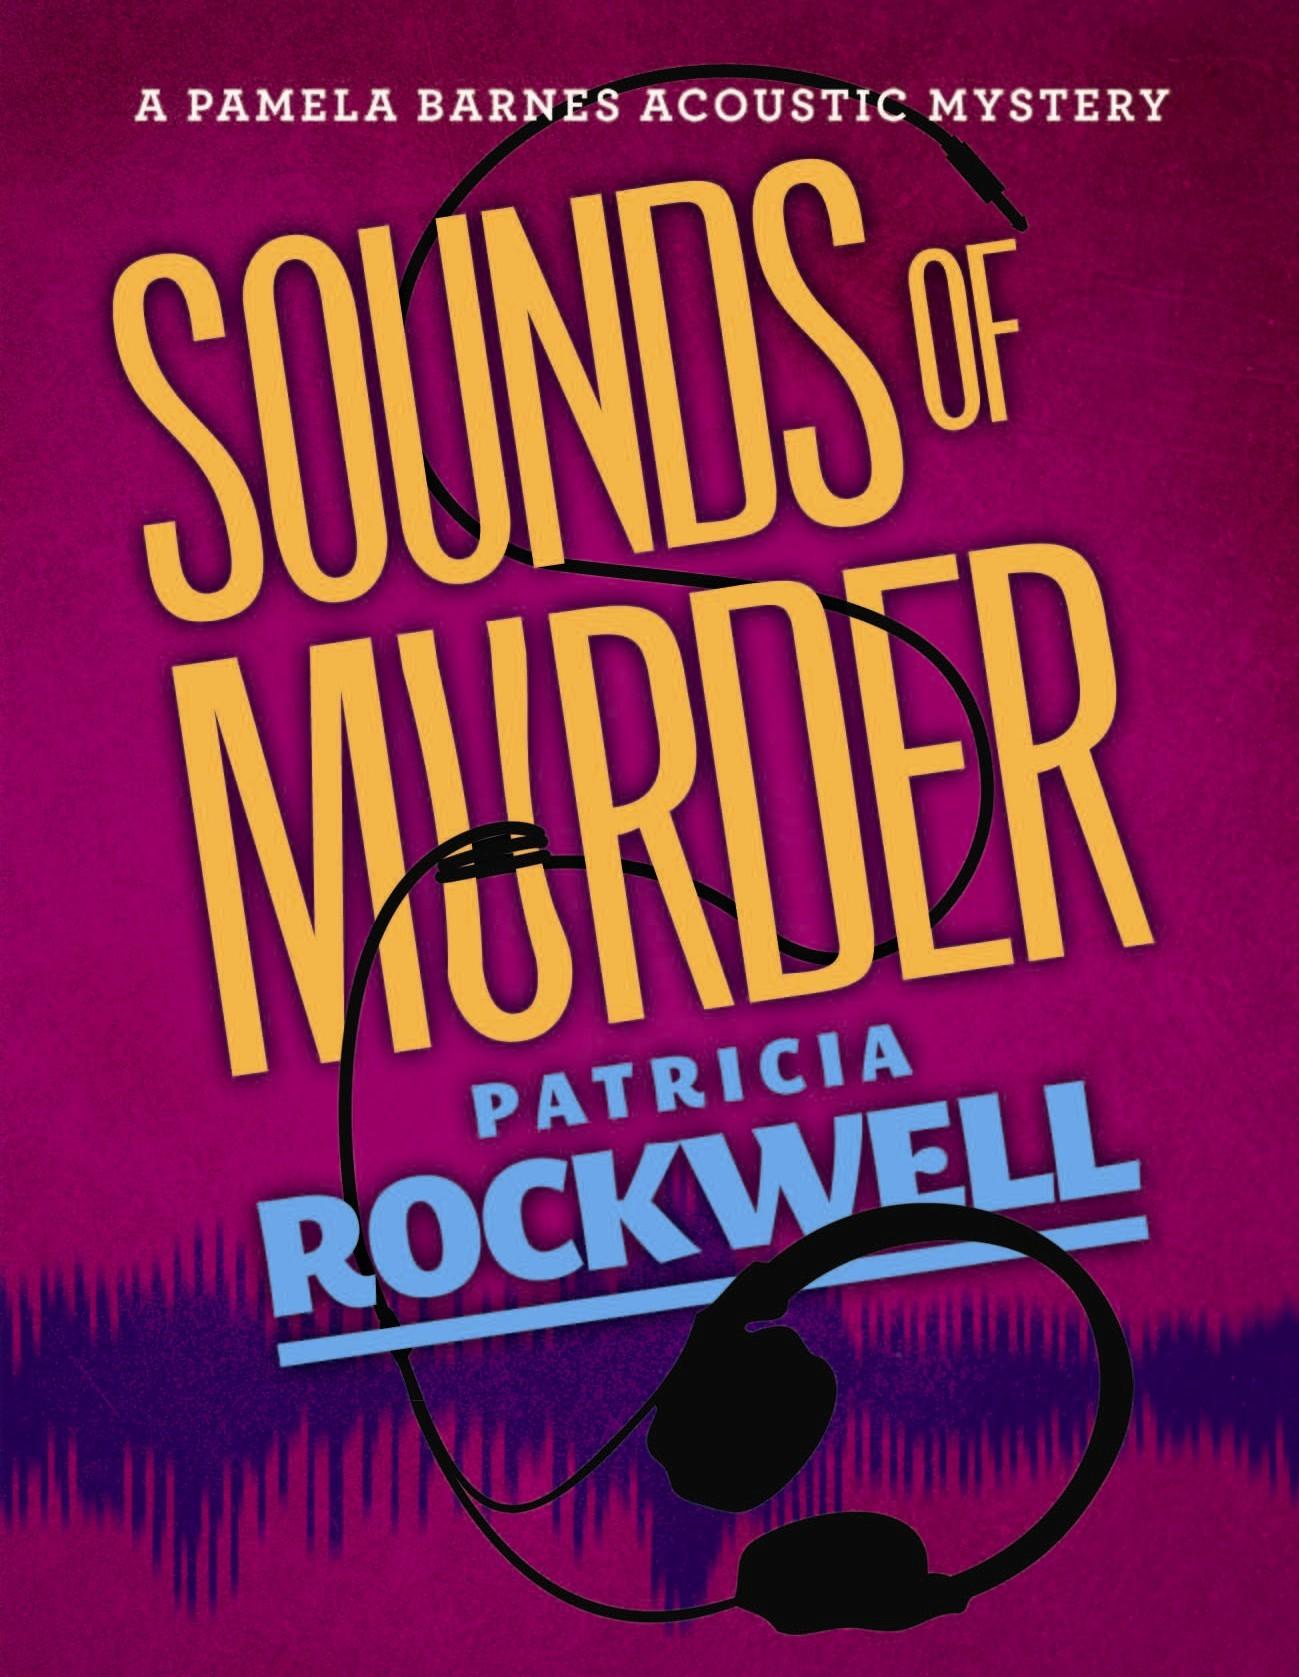 Sounds of Murder